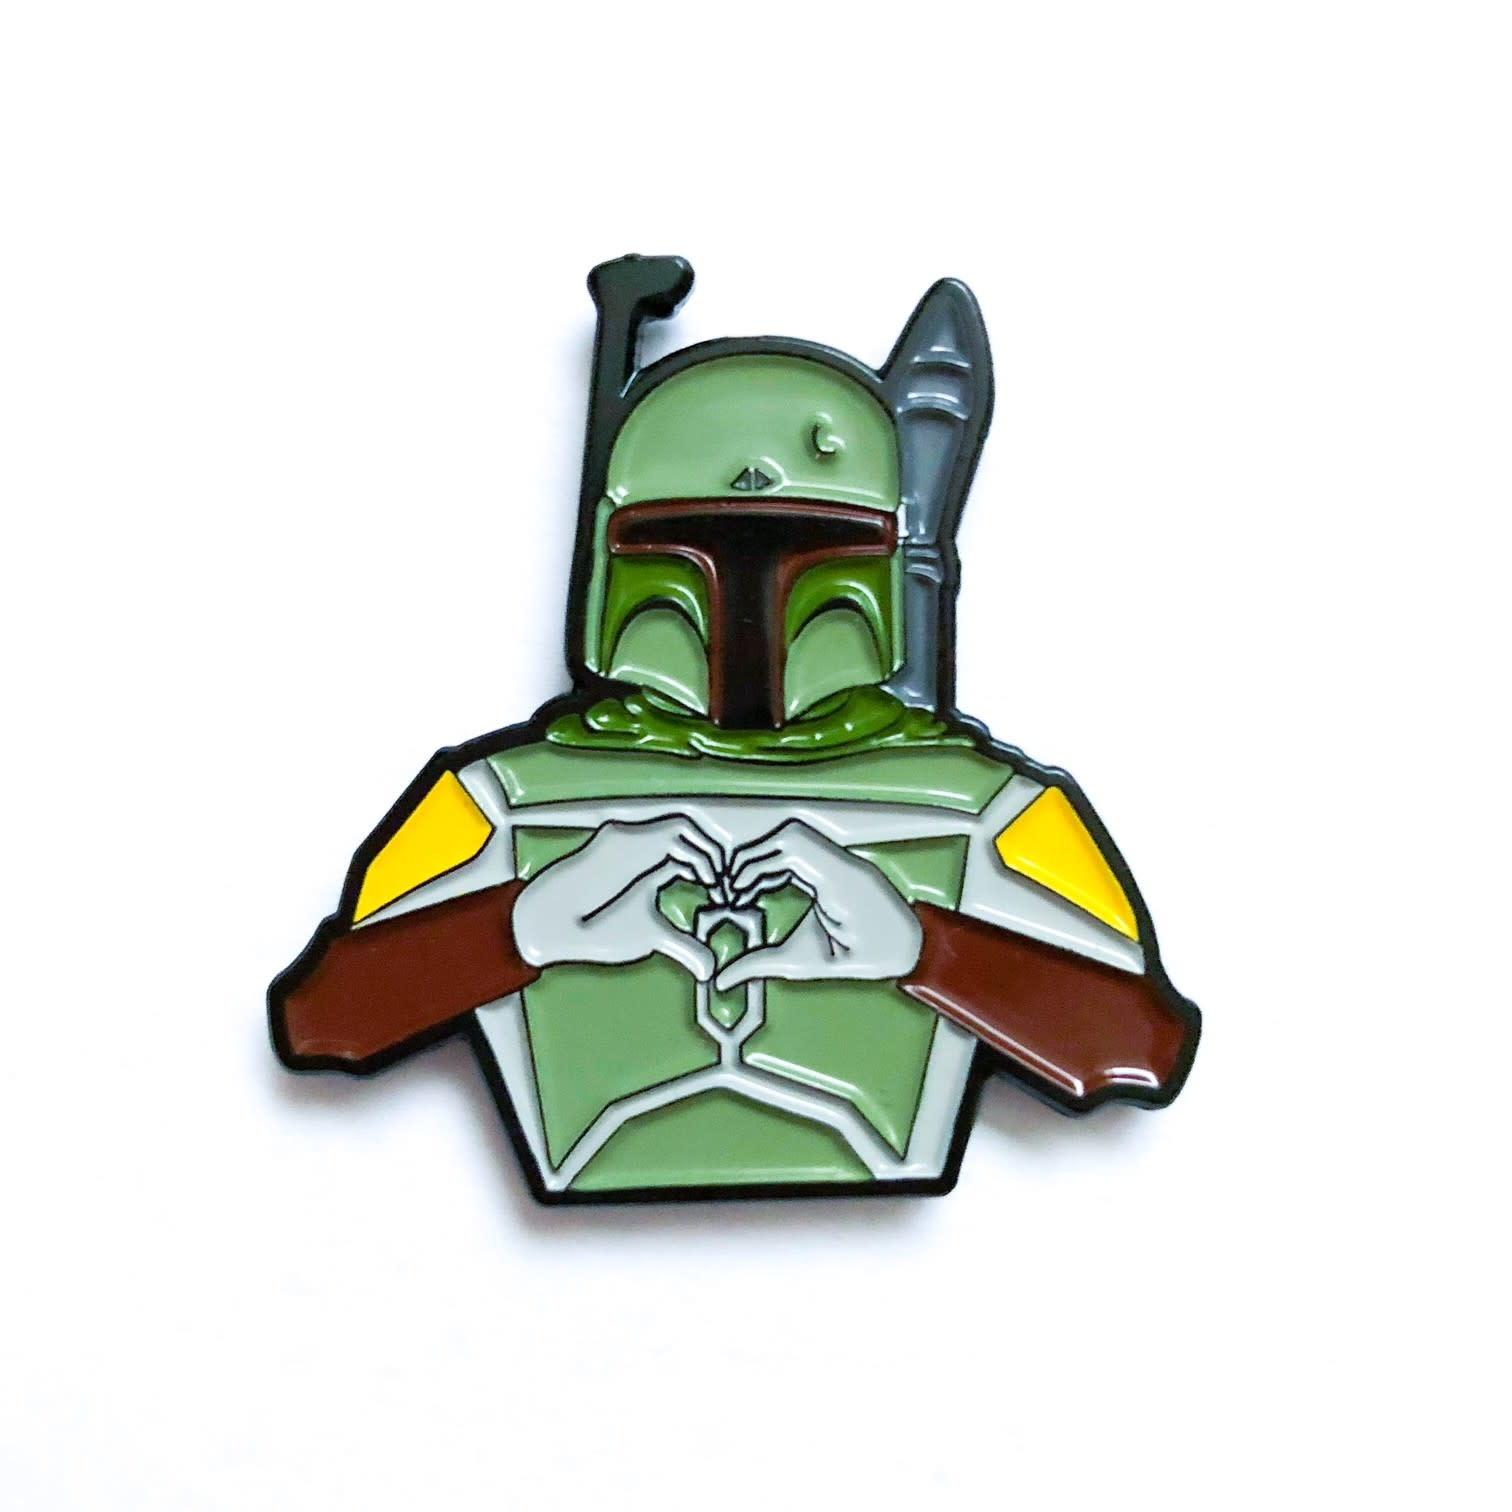 DKE Star Wars: I heart U - Boba Fett Pin